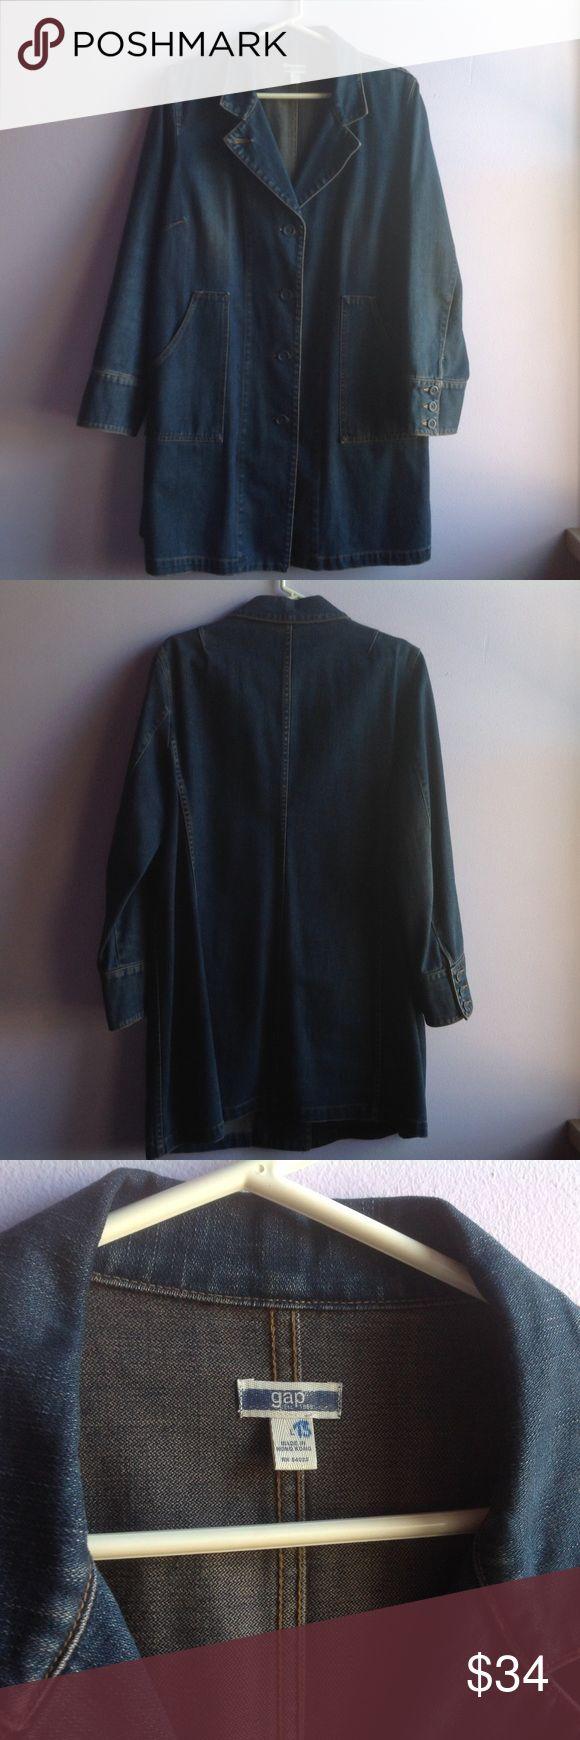 "Gap Denim Jacket (Denim Duster) Denim Jacket, tunic length (34"" from shoulder to bottom hem). A roomy size large. Smoke free home. GAP Jackets & Coats Jean Jackets"